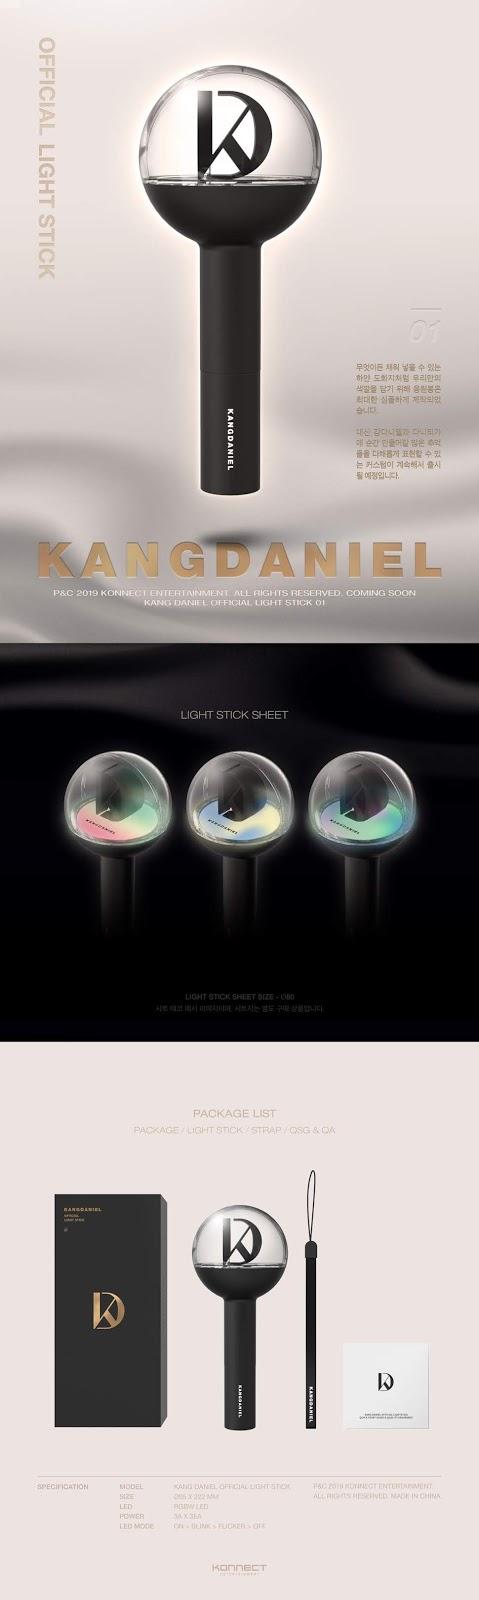 Kang Daniel Finally Has an Official Lightstick, See How It Looks